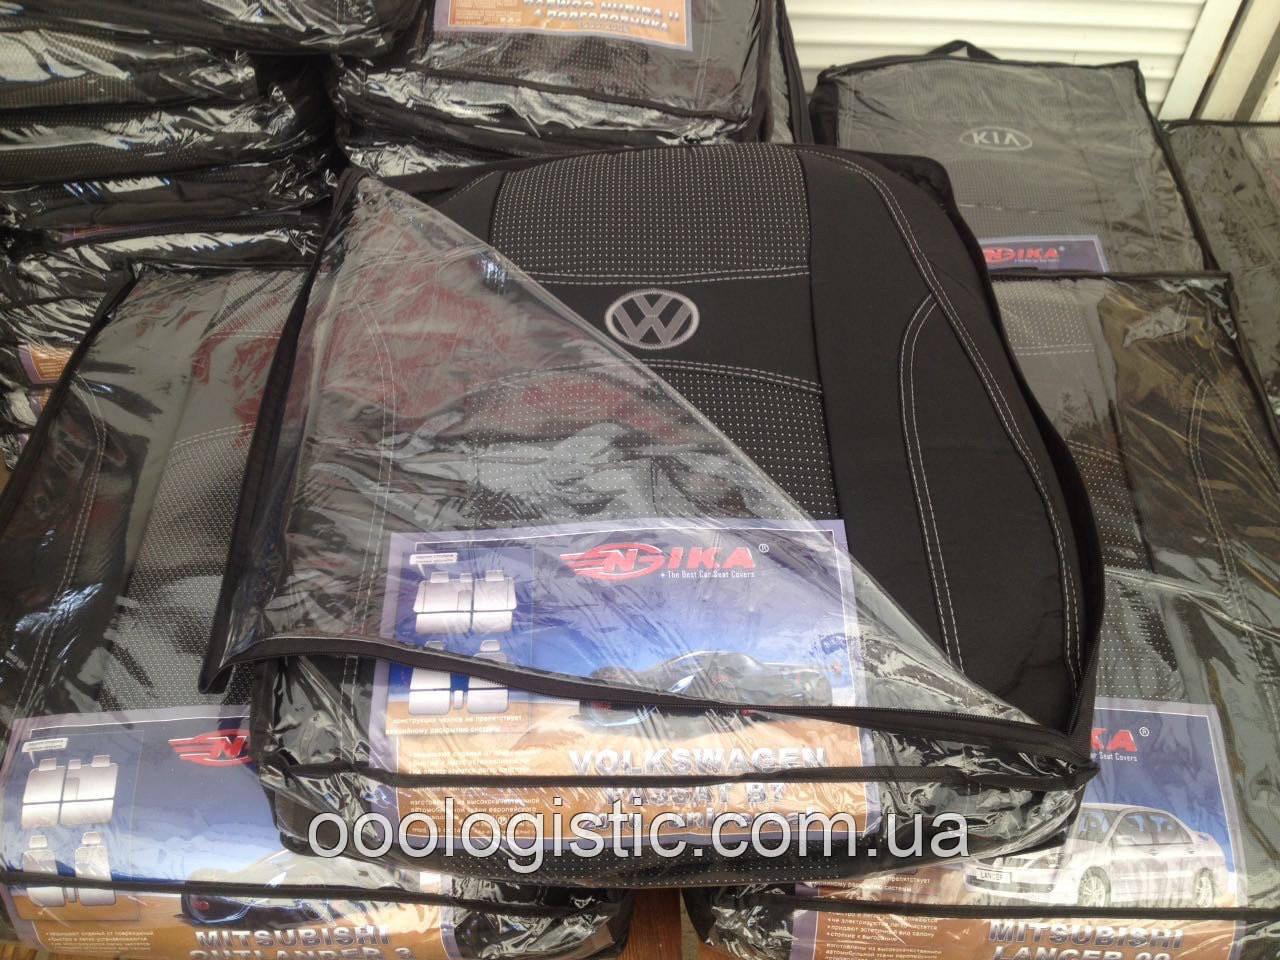 Авточехлы Nika на Volkswagen Passat B7 2010> универсал